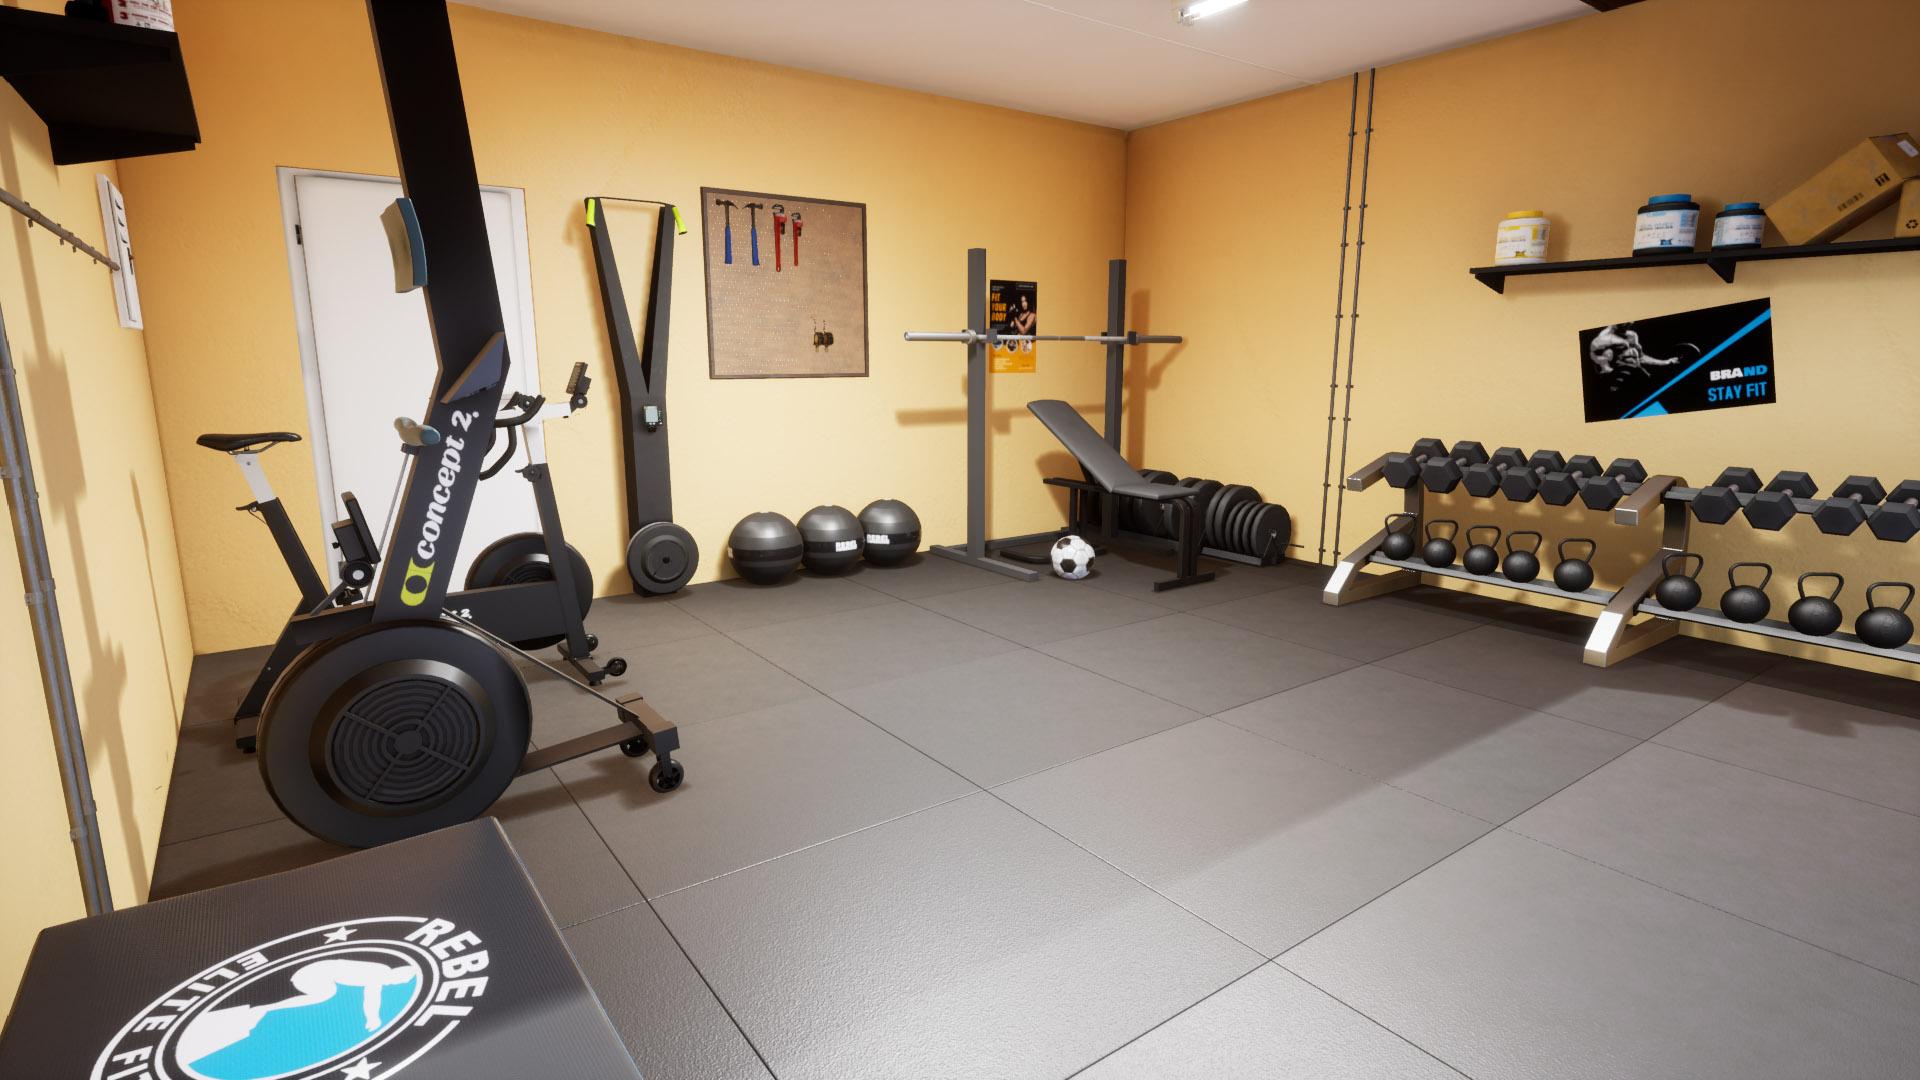 Rebel Gym Design for a home gym, in a garage